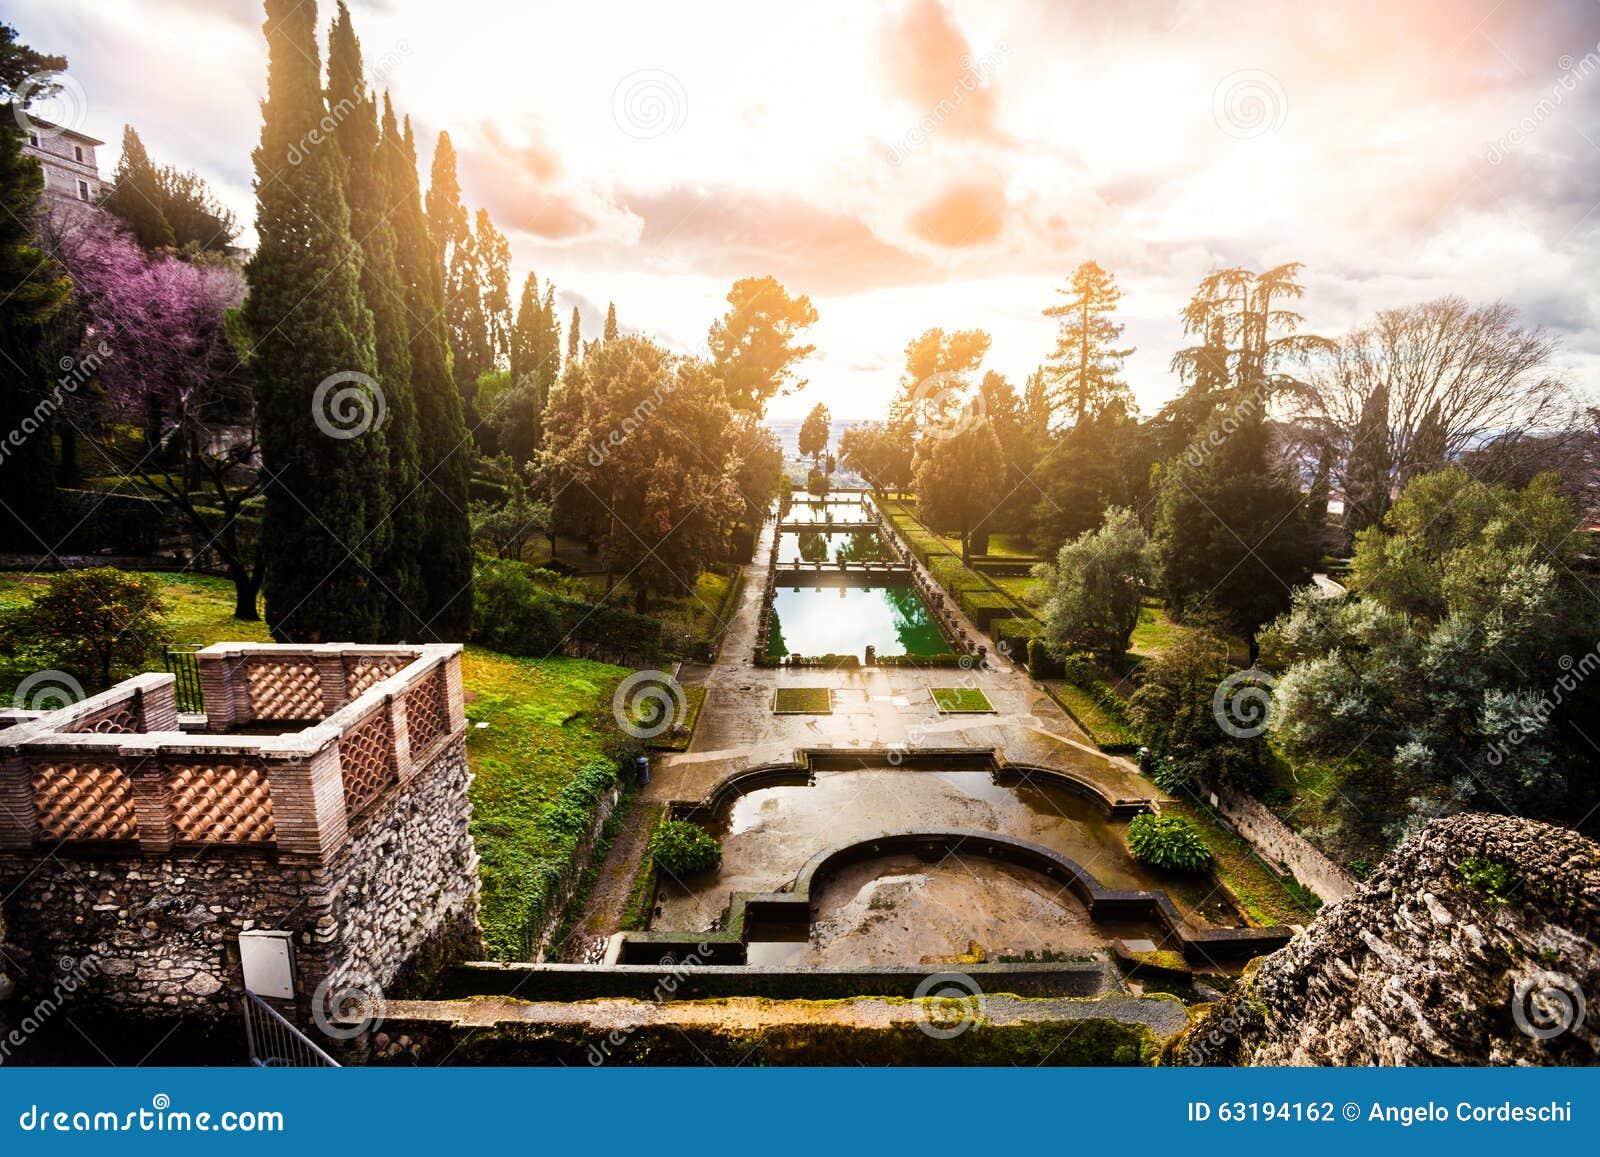 Fabulous Landscape, Gardens And Fountains. Italian Renaissance ...